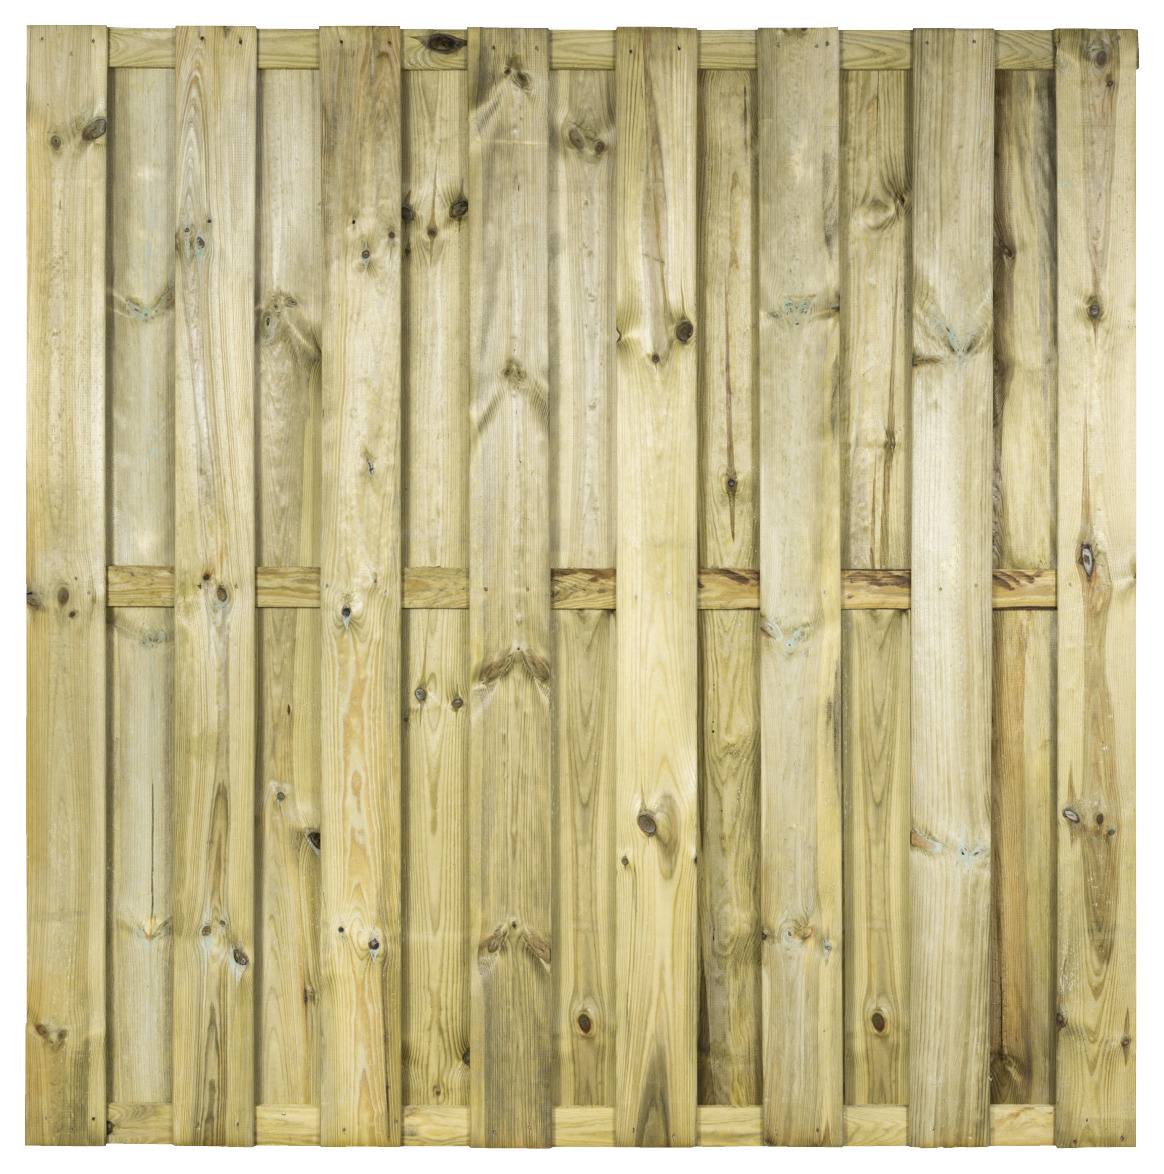 Cran de jardin jumbo droit 180x180 cm ecrans de jardin - Ecran de jardin en bois ...